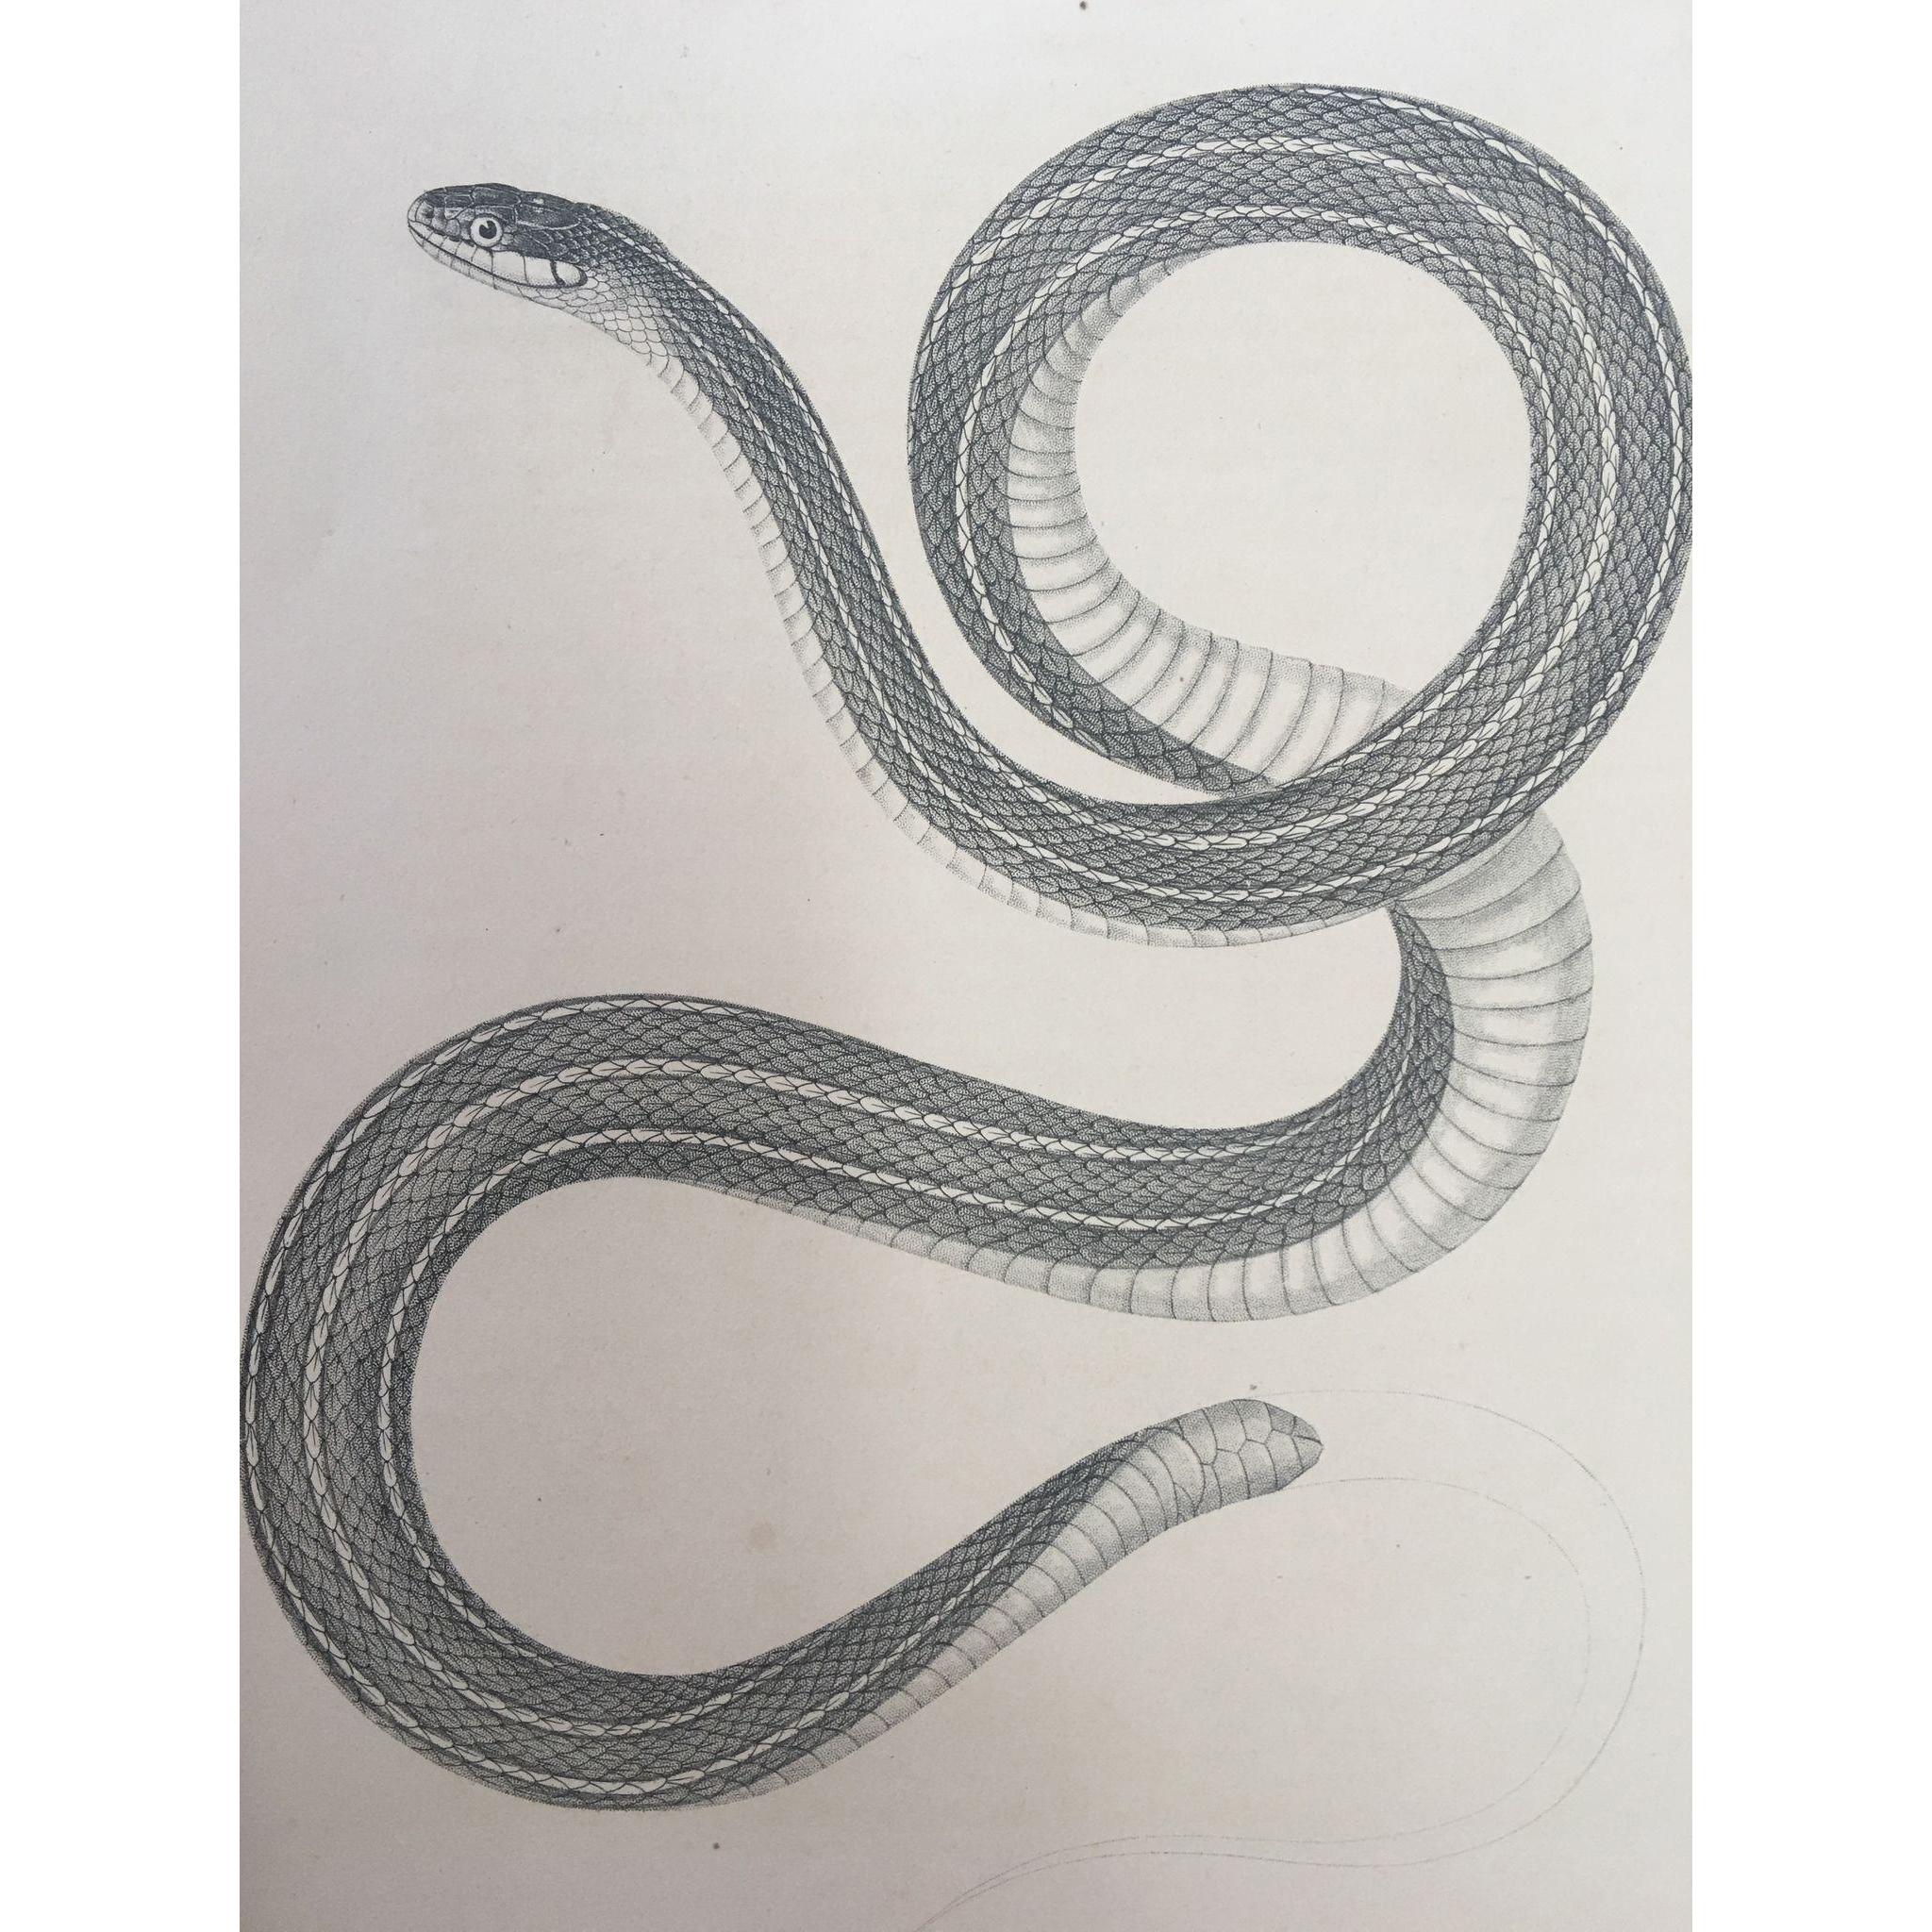 1860 U.S. P. R. R. Surveys Lithograph Print Small-Headed Striped Snake Plate # XIII